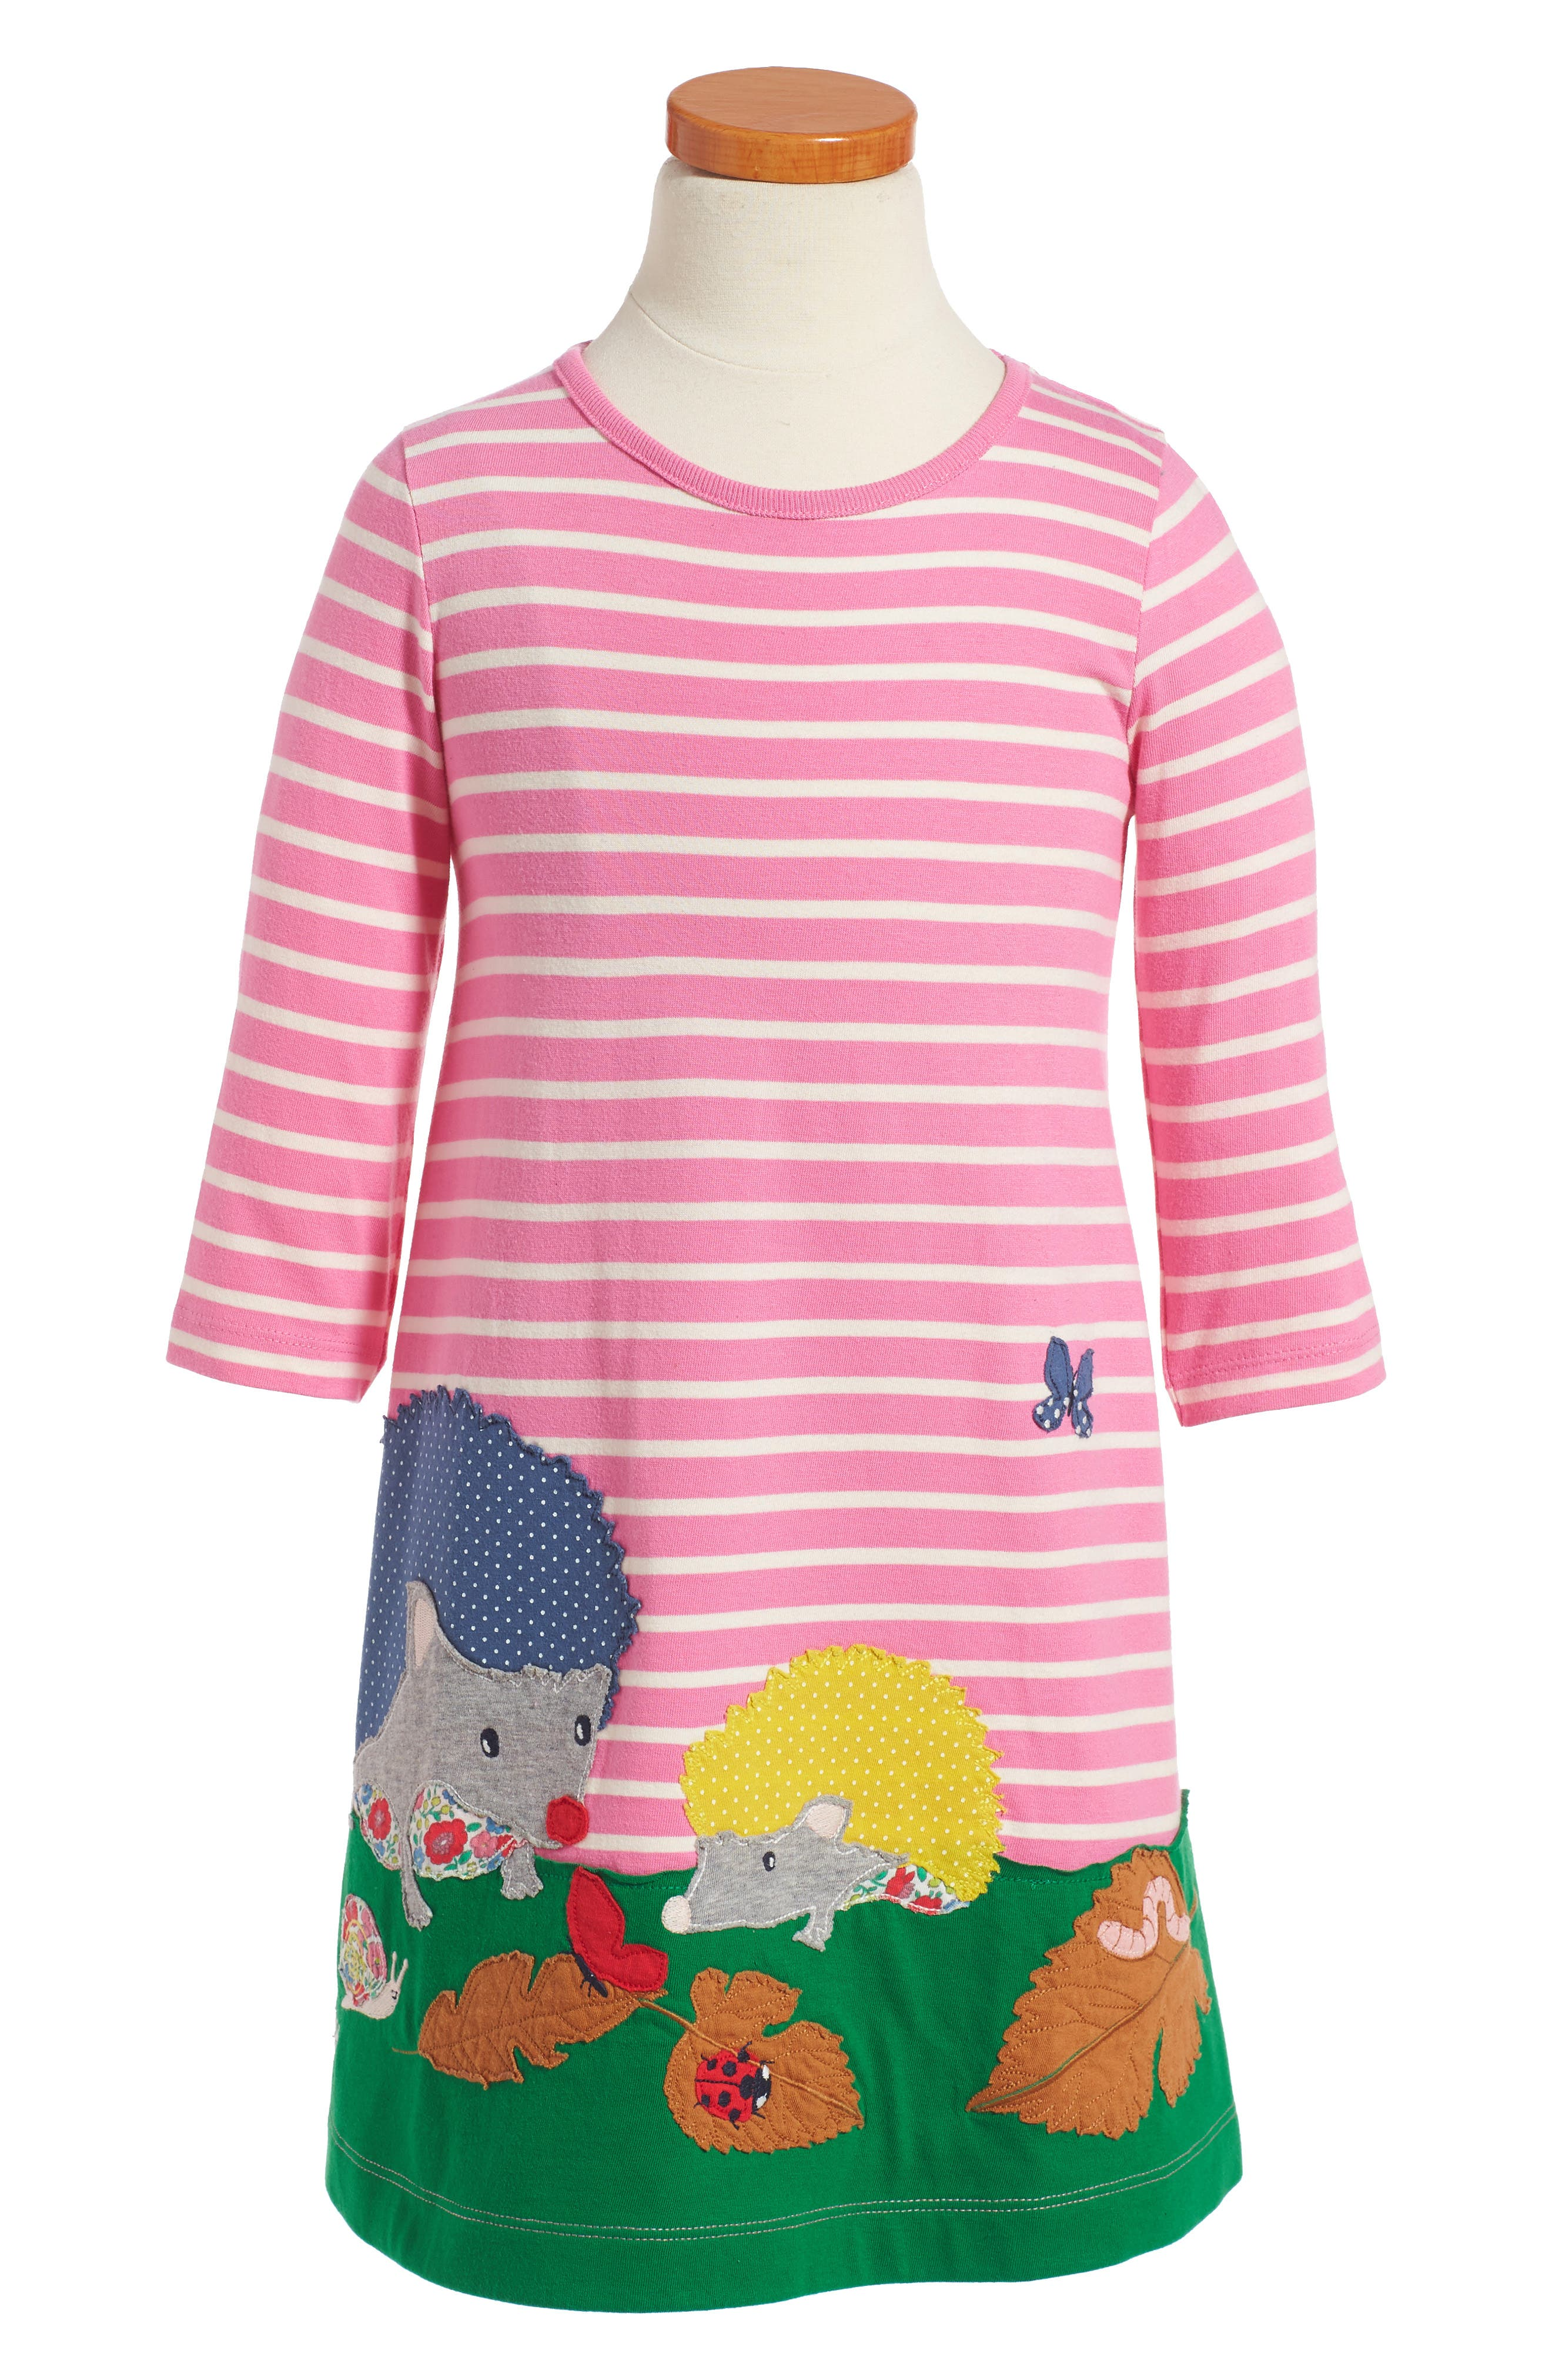 Alternate Image 1 Selected - Mini Boden Woodland Friends Dress (Toddler Girls, Little Girls & Big Girls)